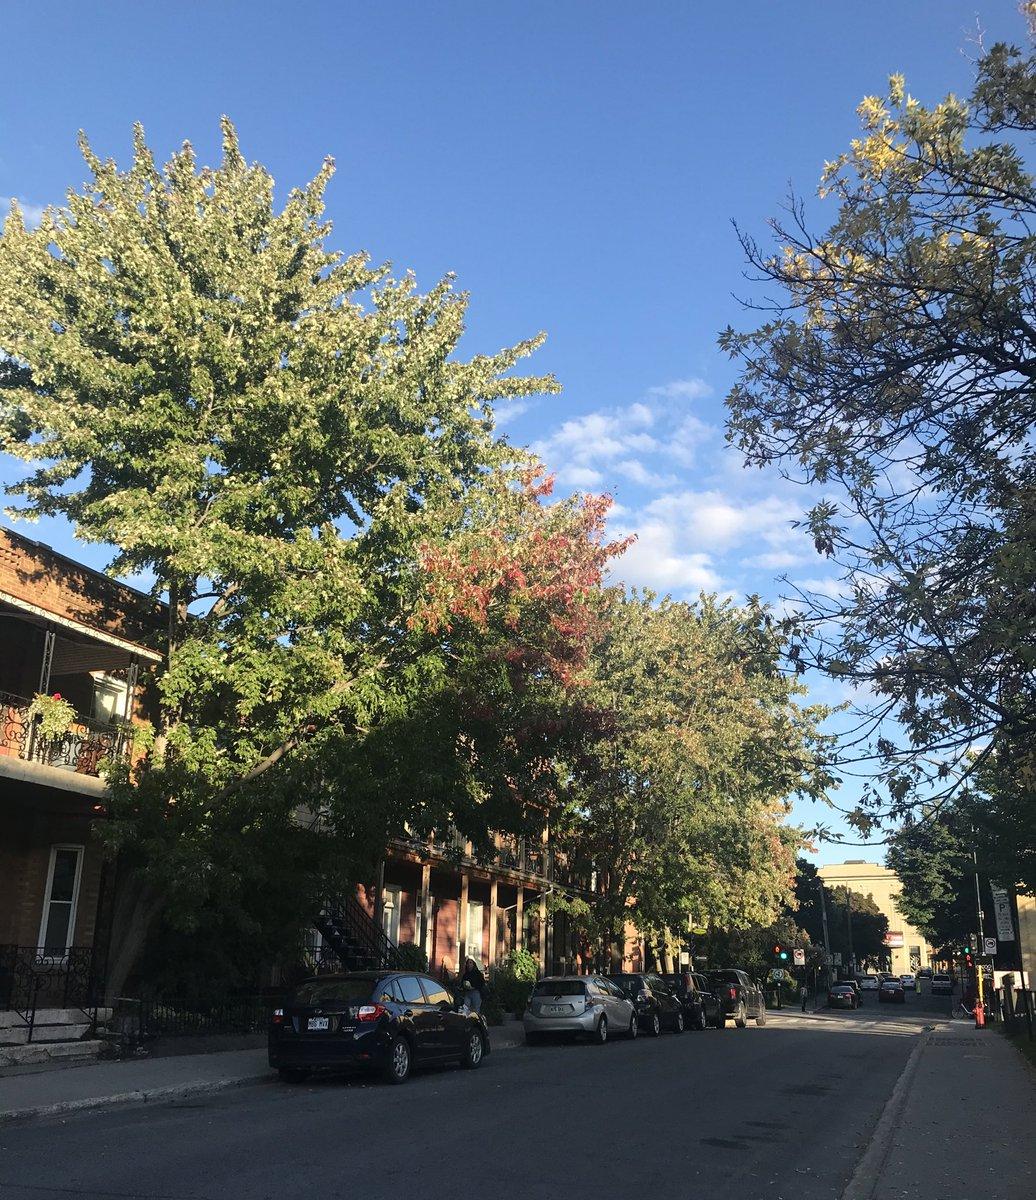 I see you #autumn #trees #yellowleafs 🍂 #goodbyesummer https://t.co/T2LF1AZ0ea